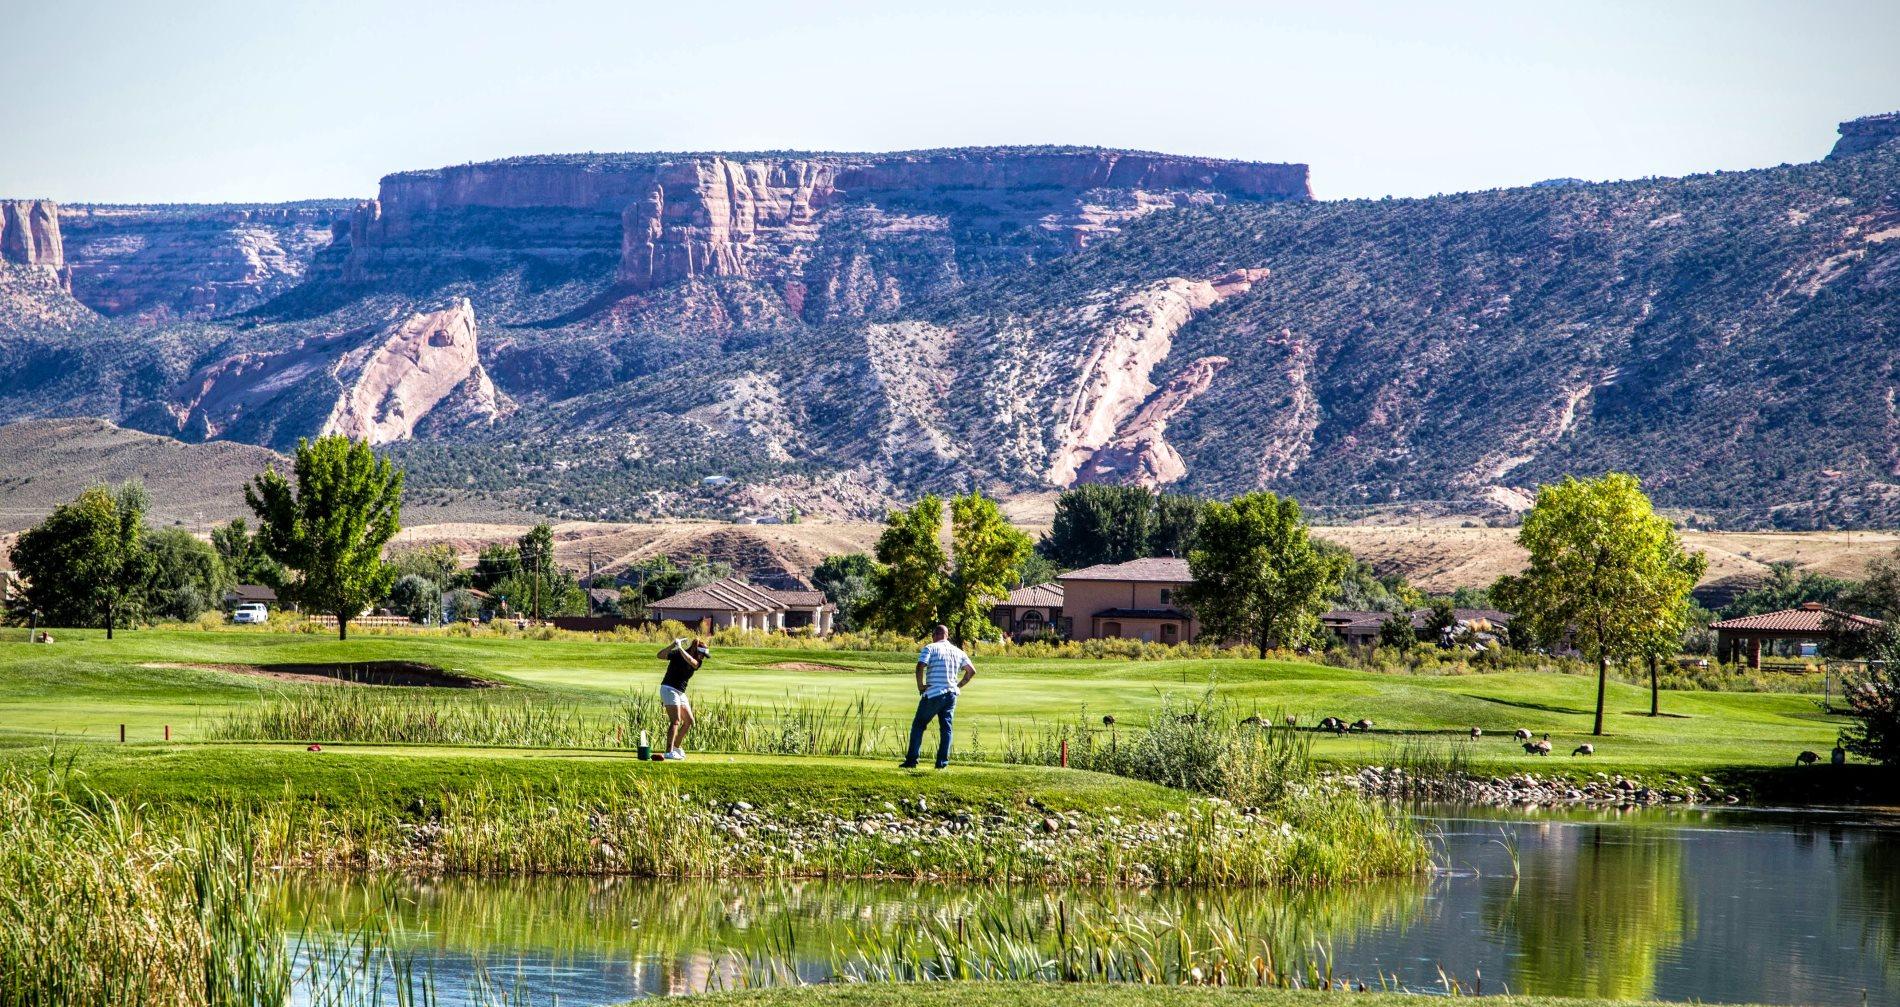 Adobe Creek Golf Course